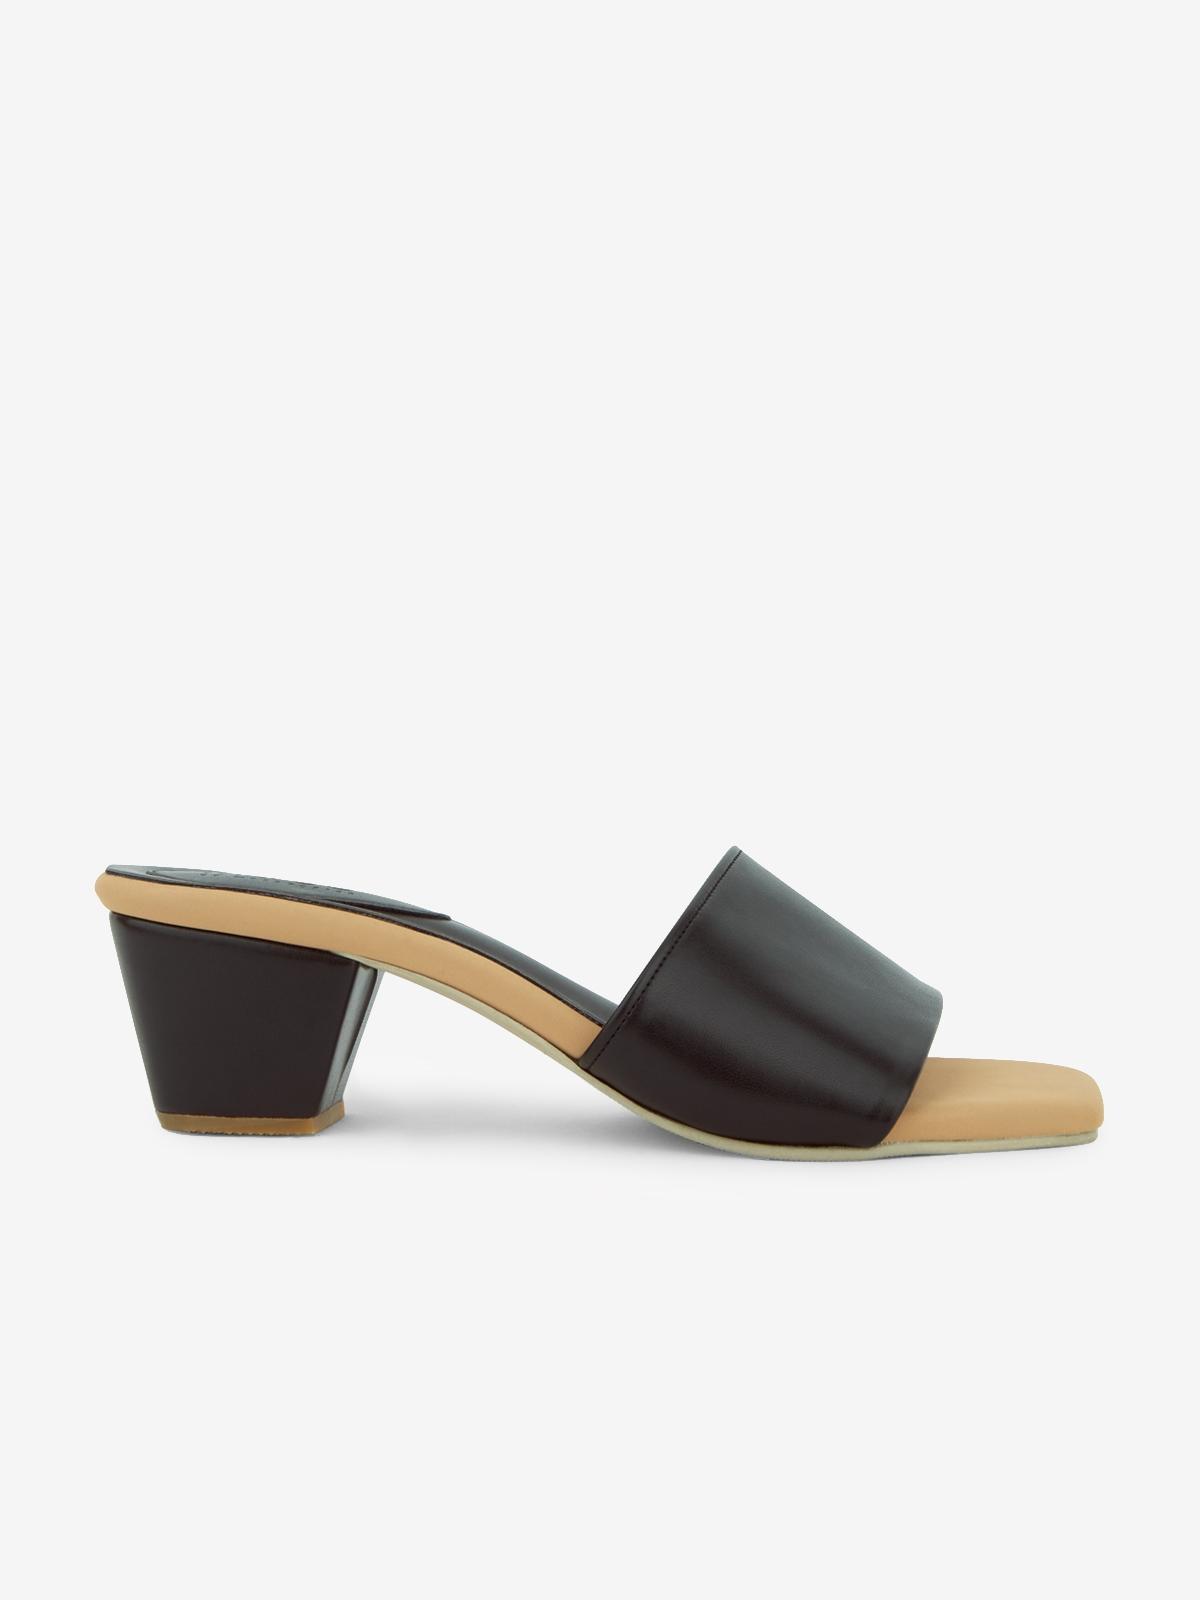 Square Toe Heel Slippers Black